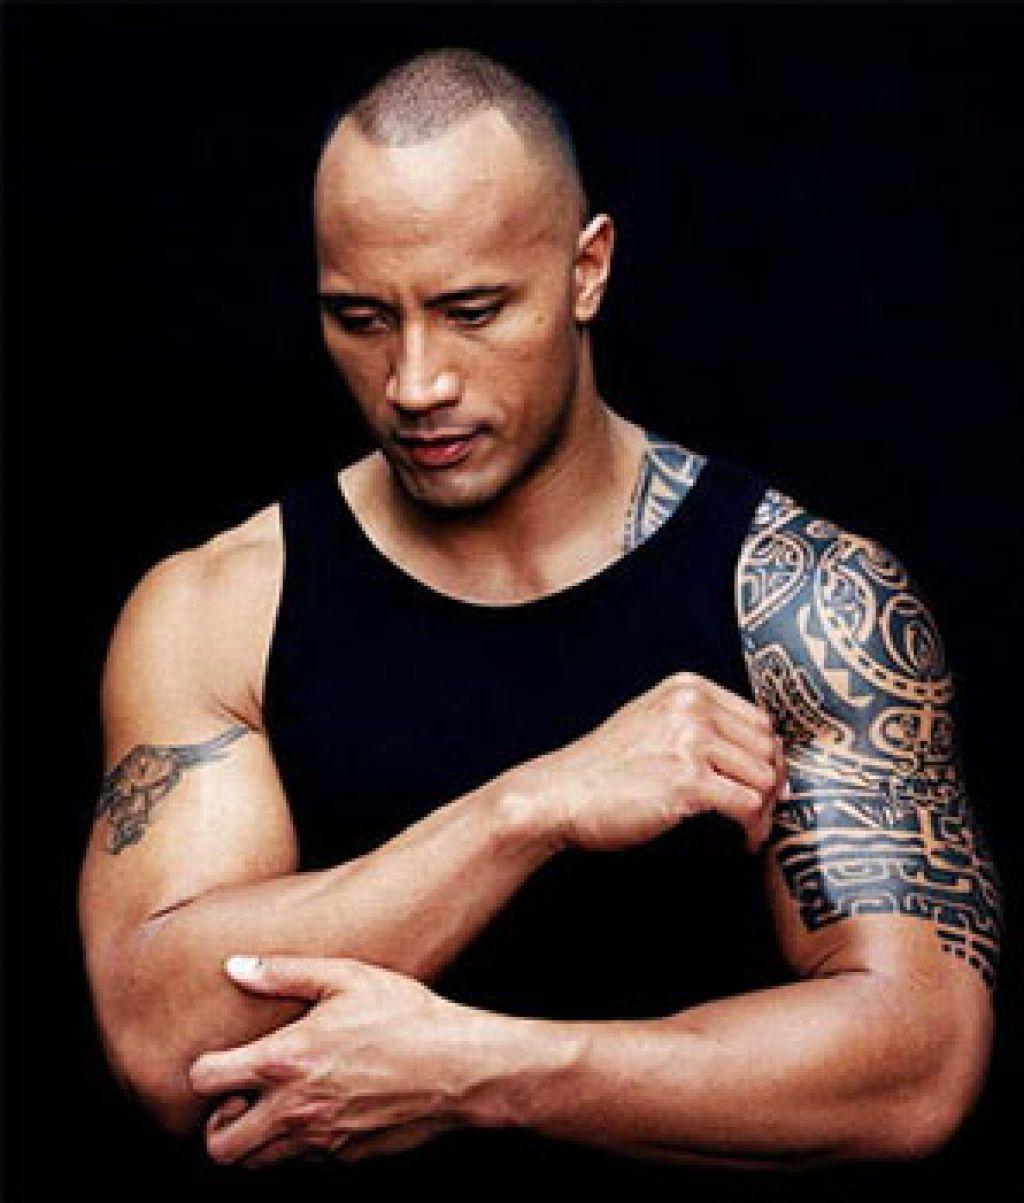 Dwayne Johnson Famous Tattoo Artist Pictures